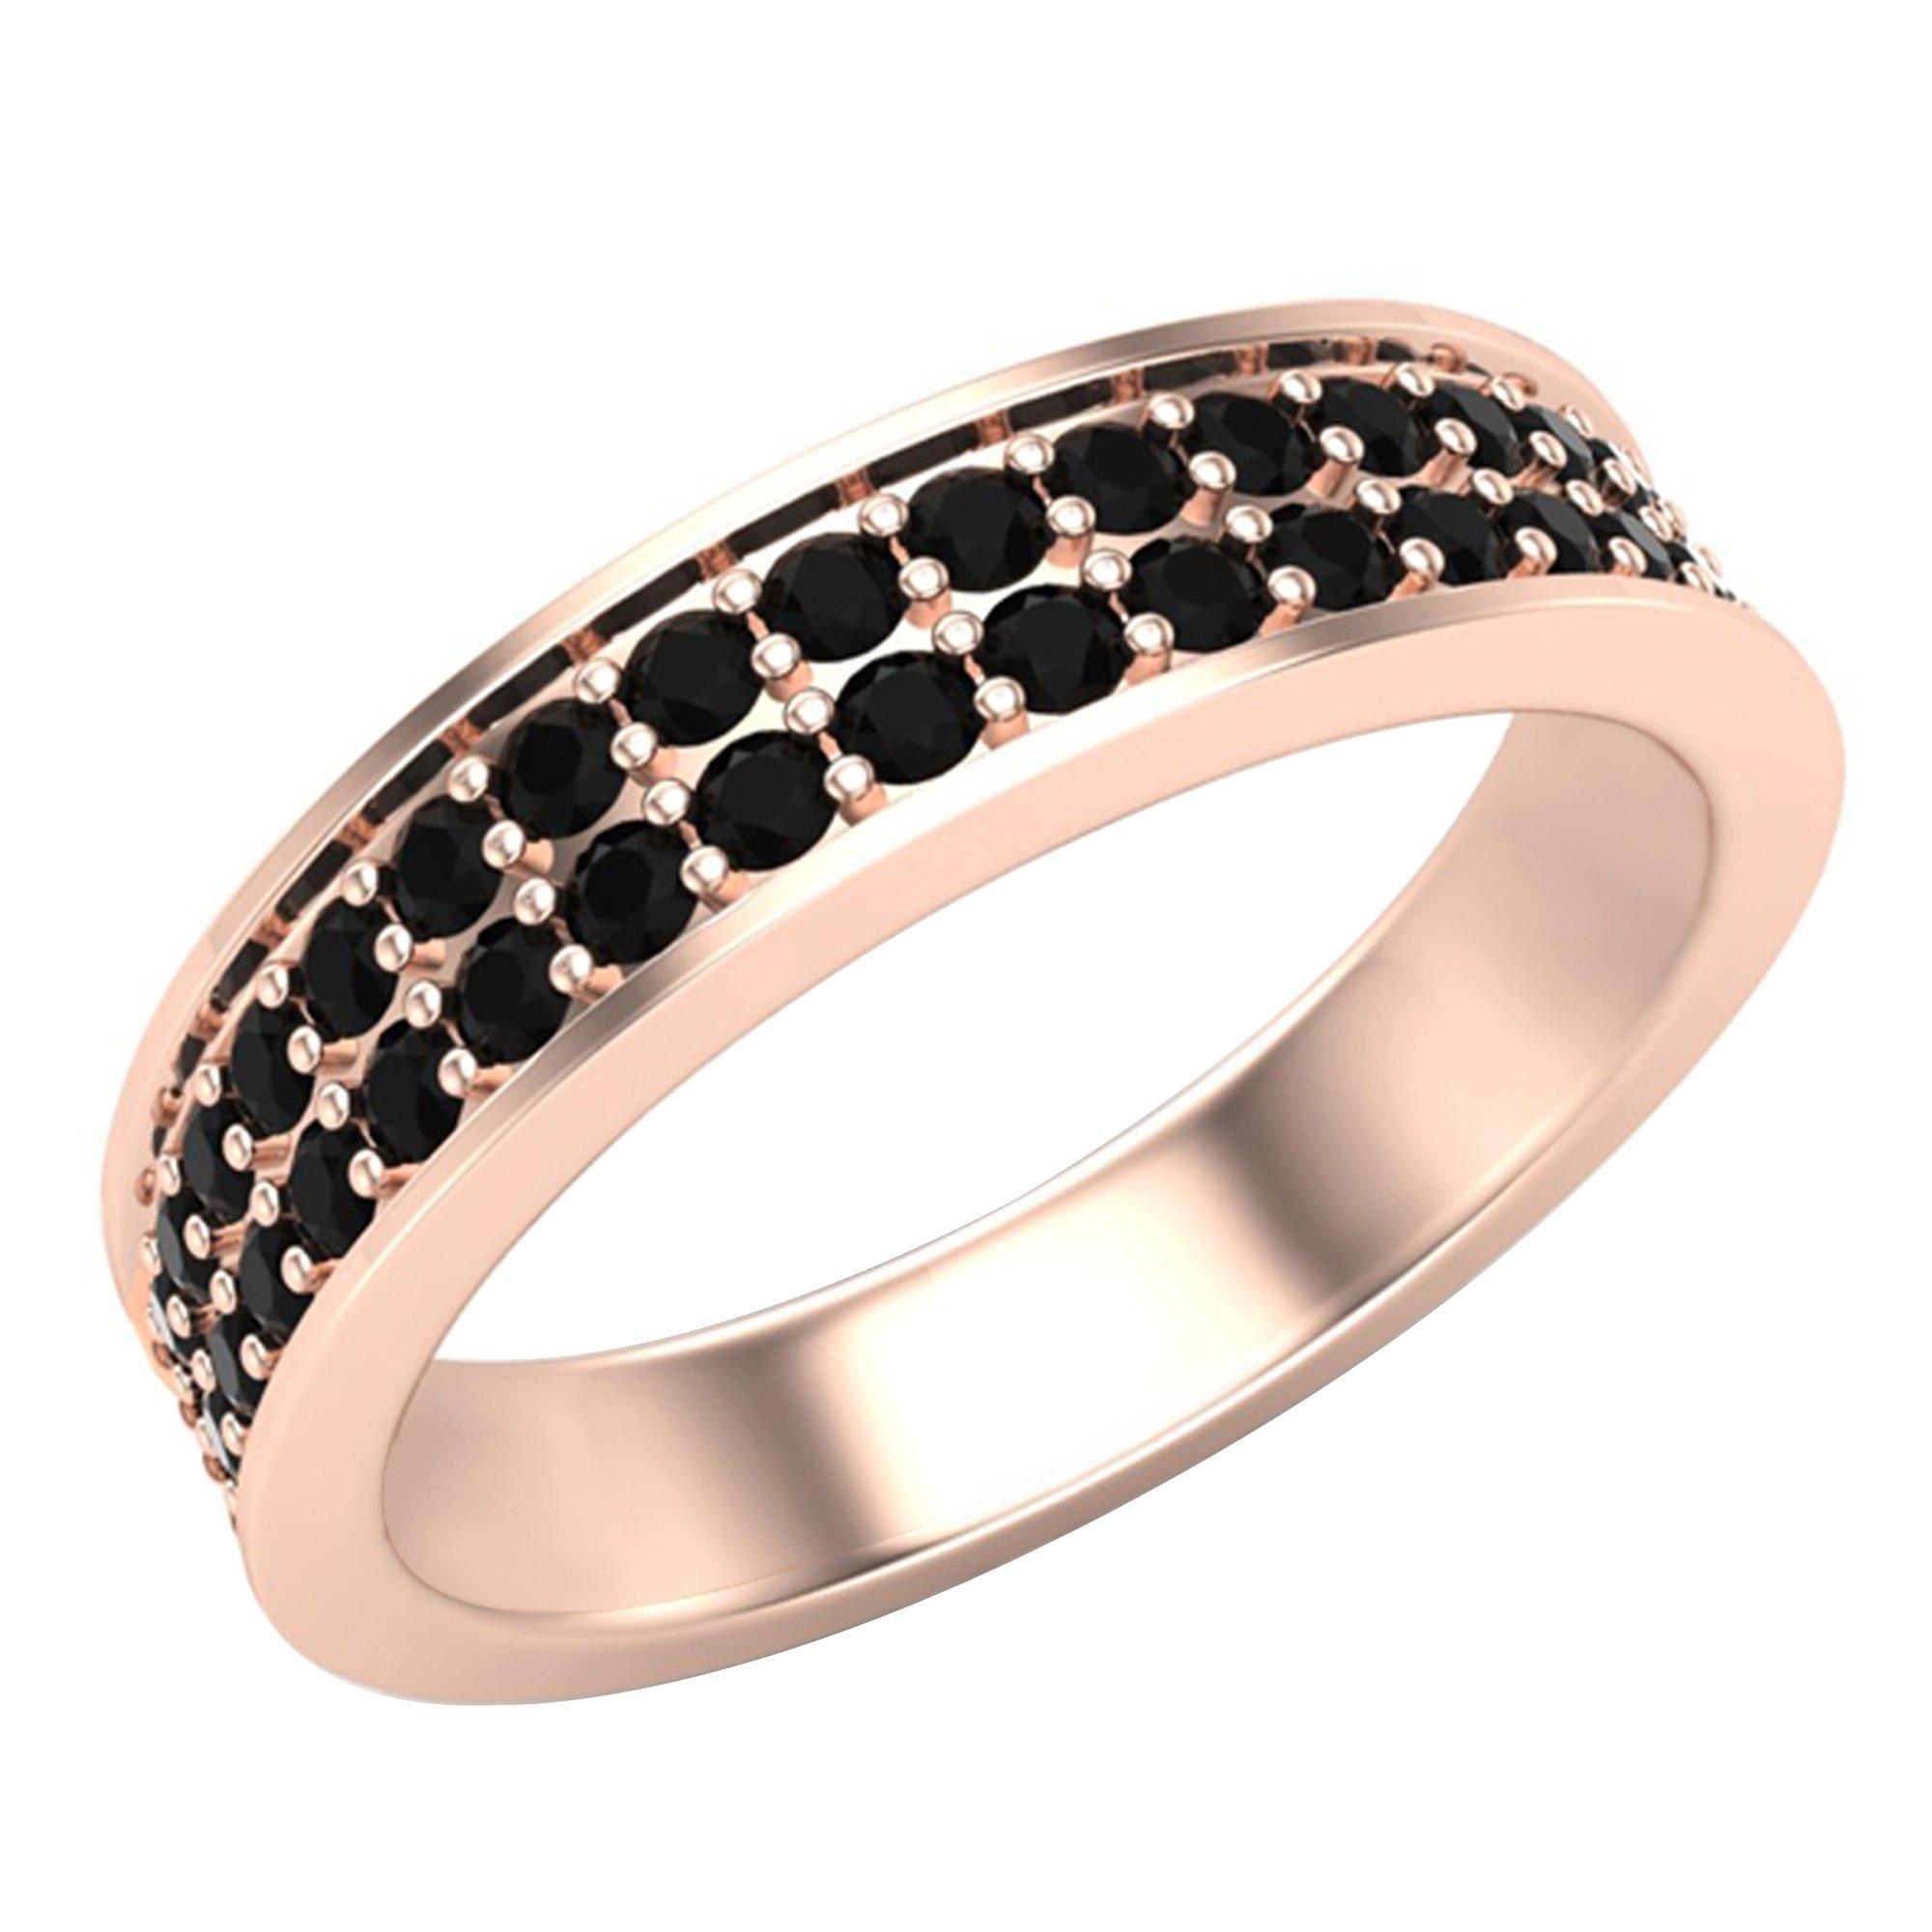 Men's Black Diamond Wedding Band 0.75 ctw Two-Row Half Way Men's 14K Rose Gold 5mm (Ring Size 9)